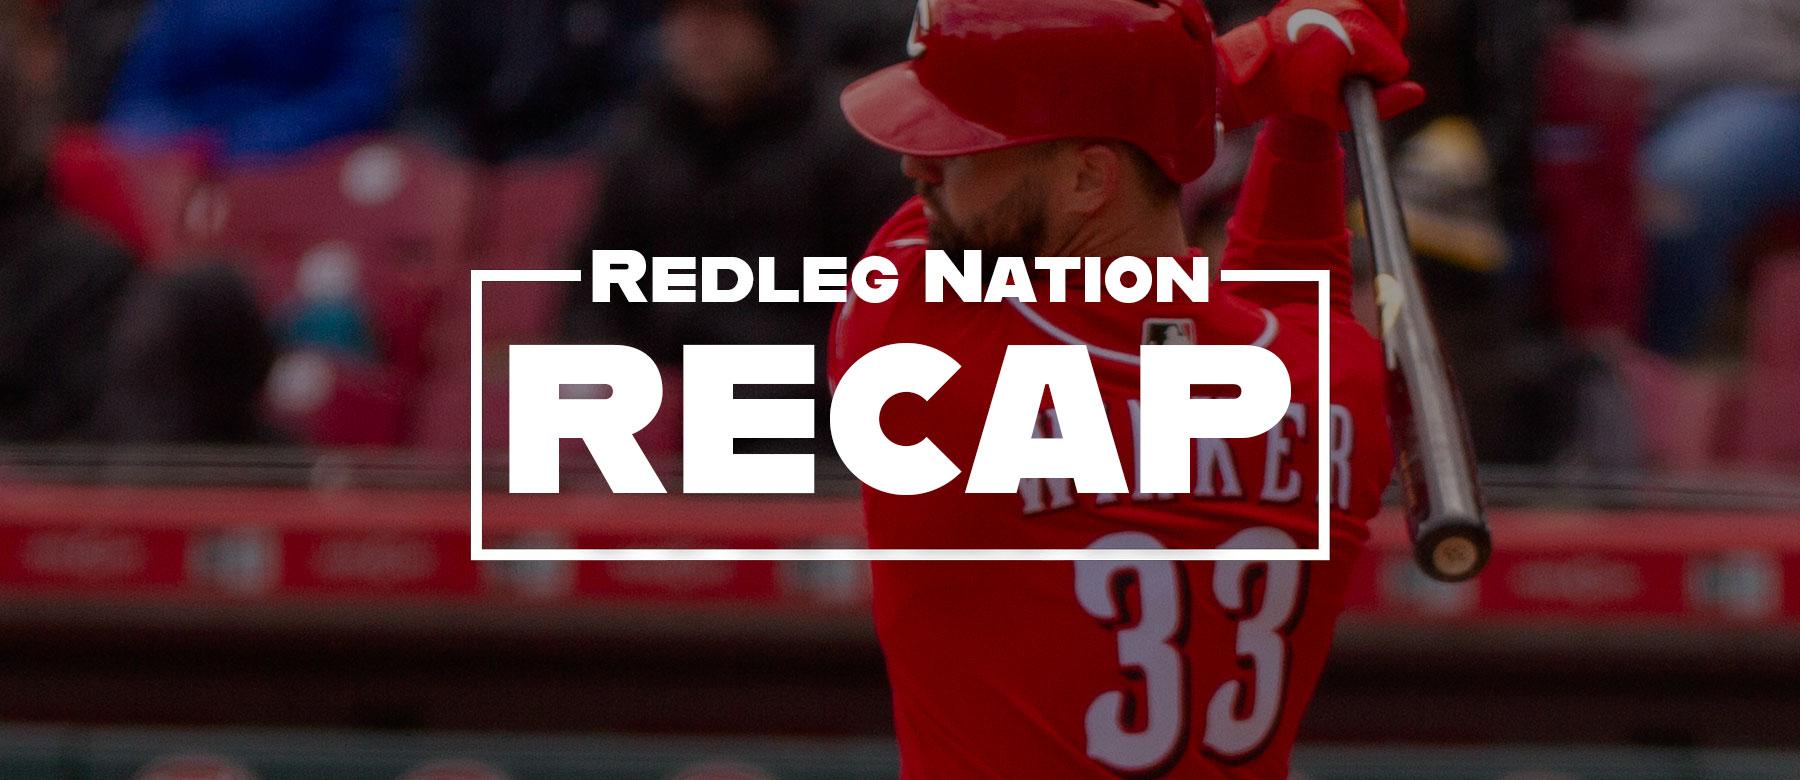 Reds Recap: Two big Rockies innings doom Cincinnati - Redleg Nation